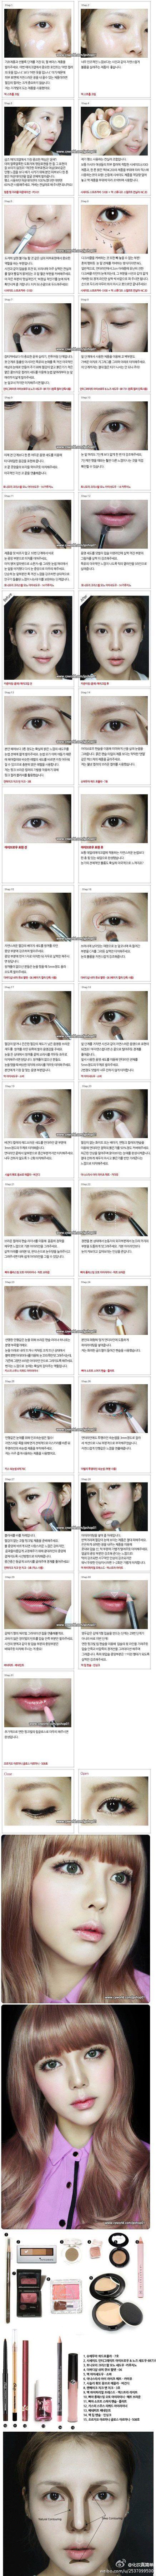 Deep conturing/face shaping